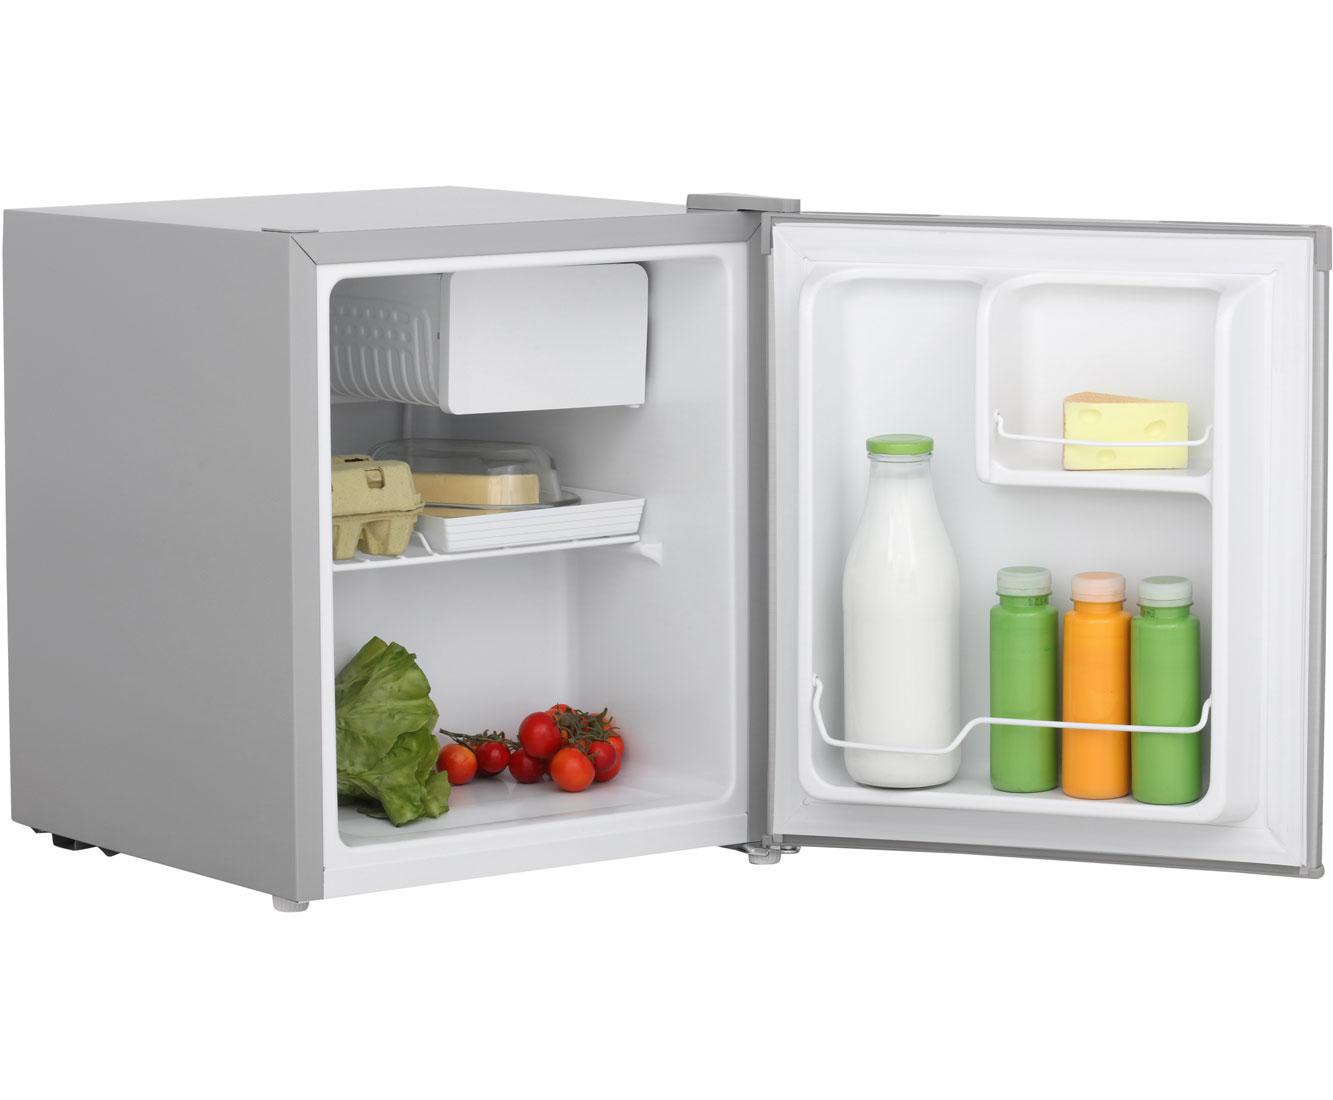 Bomann Kühlschrank Qualität : Bomann kb kühlschrank silber a